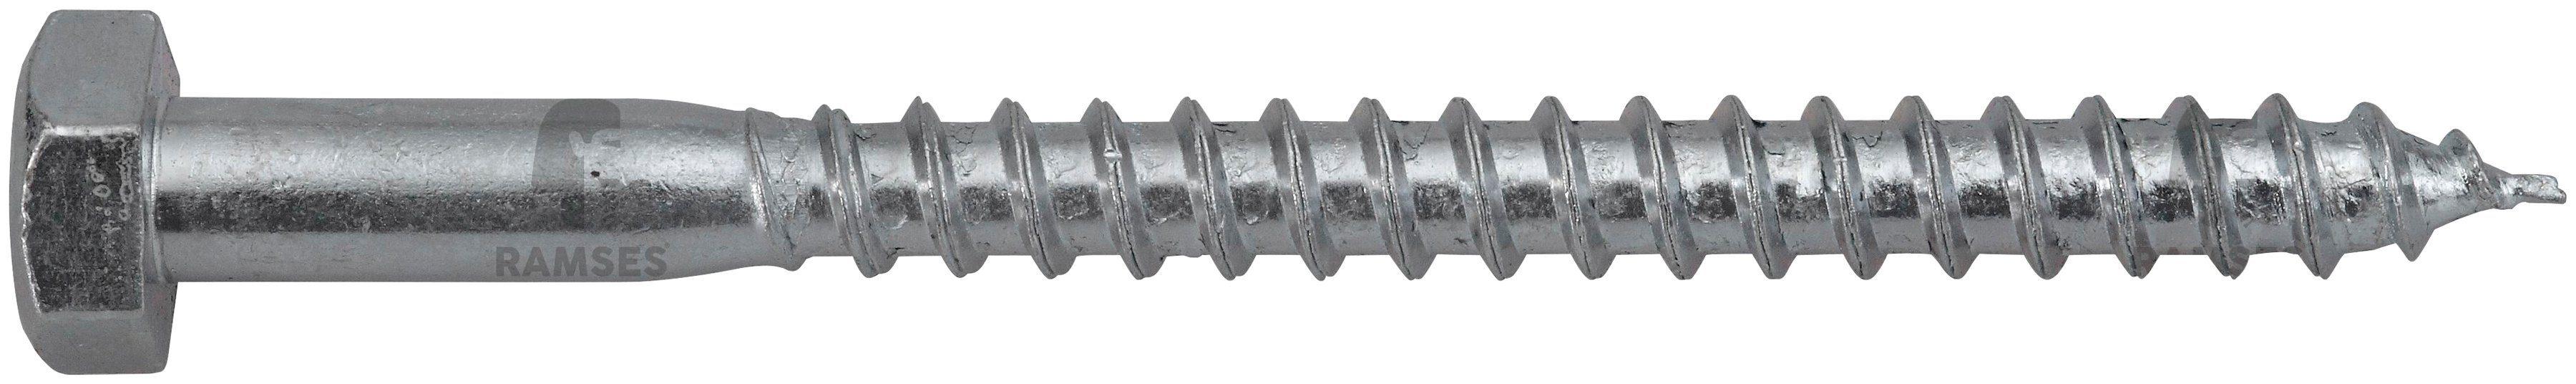 RAMSES Schrauben , Sechskant-Holzschraube 12 x 200 mm 25 Stk.